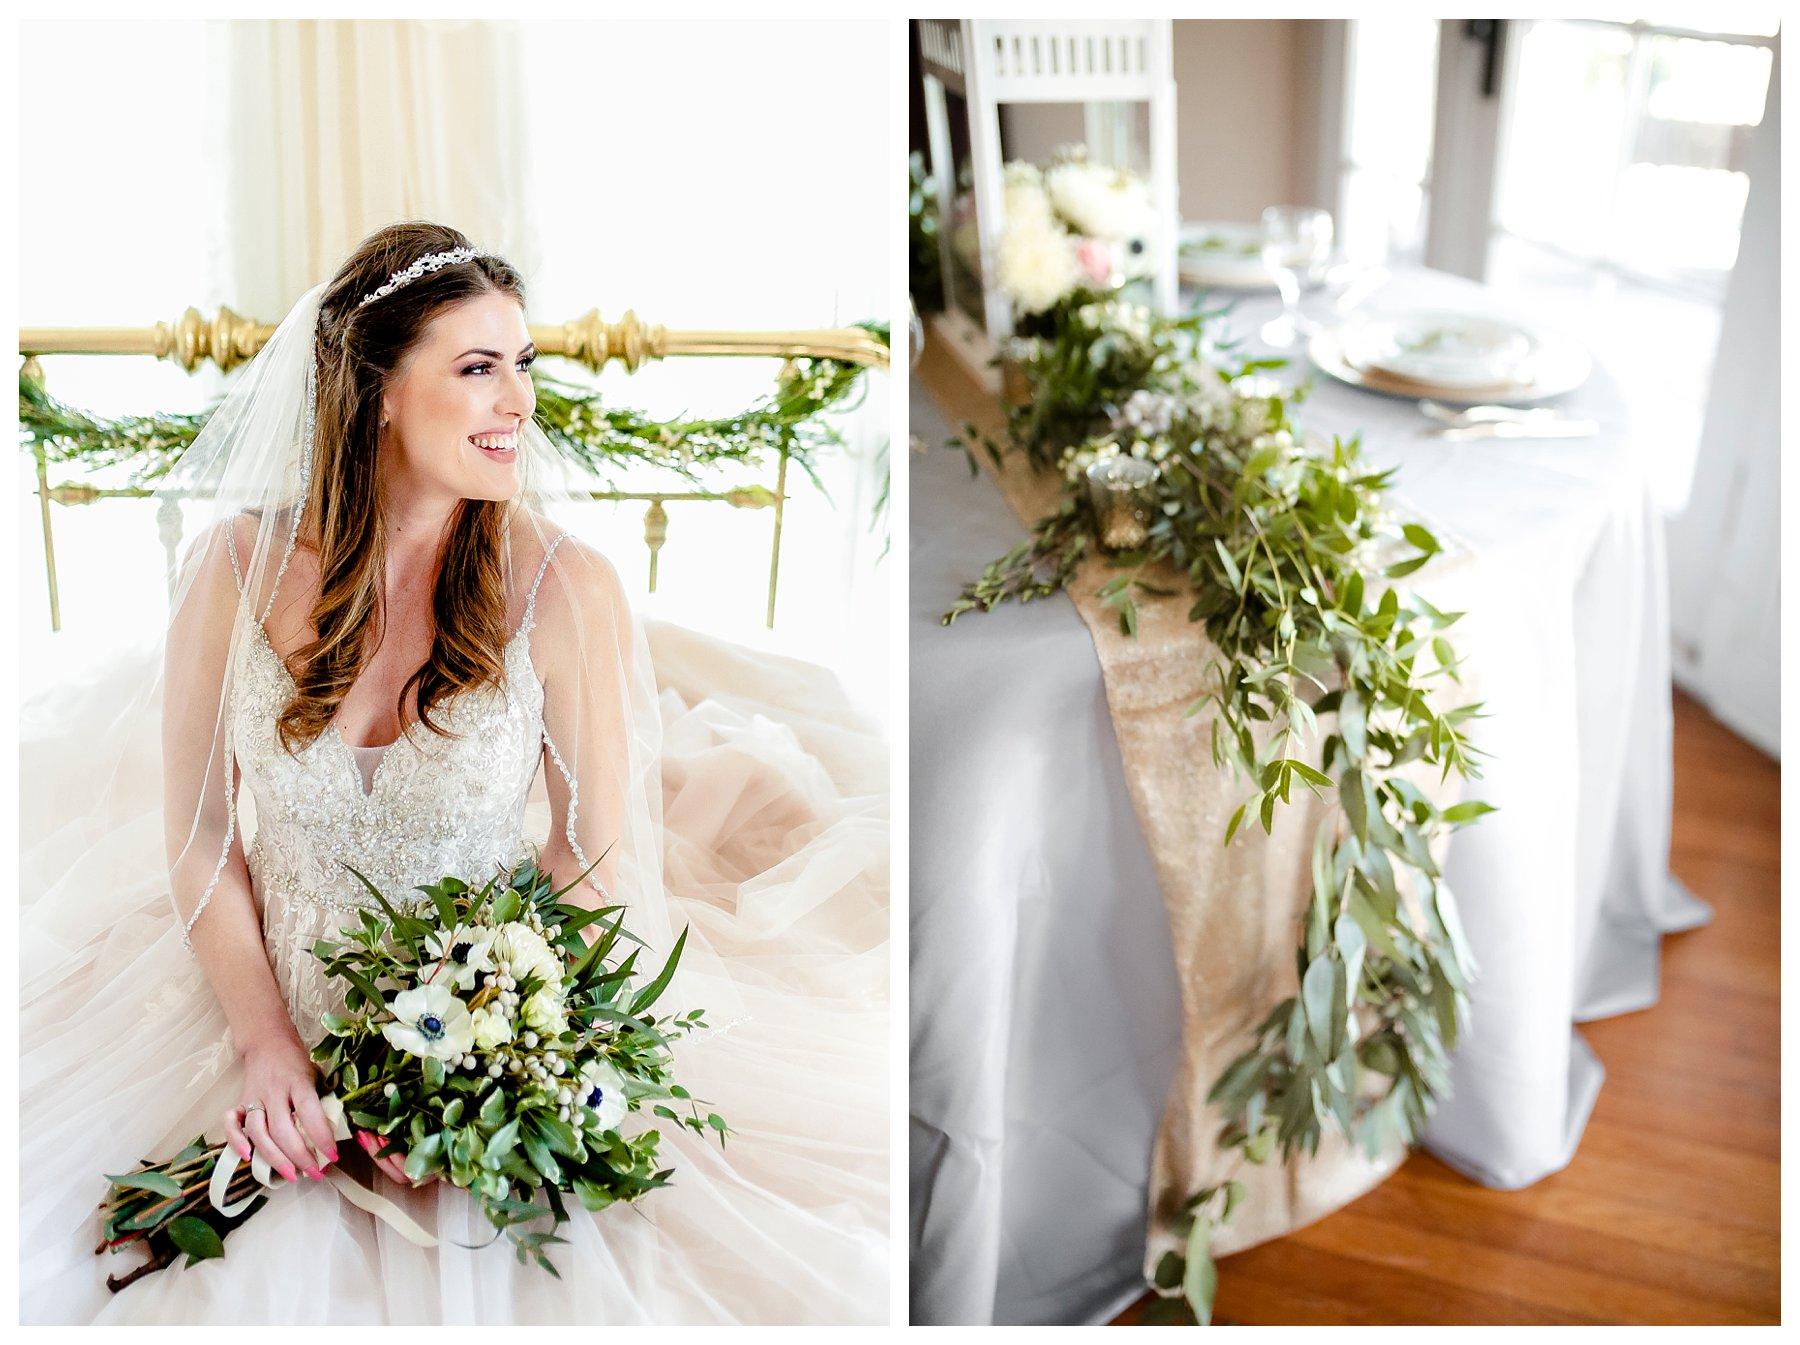 photographer_wedding_saint_louis_Kansas_City_Photography_Videography_workshop_training_styled_engagement_Lake_Ozark_KC_MO_STL_Rolla_Hermann_Saint_James_0349.jpg